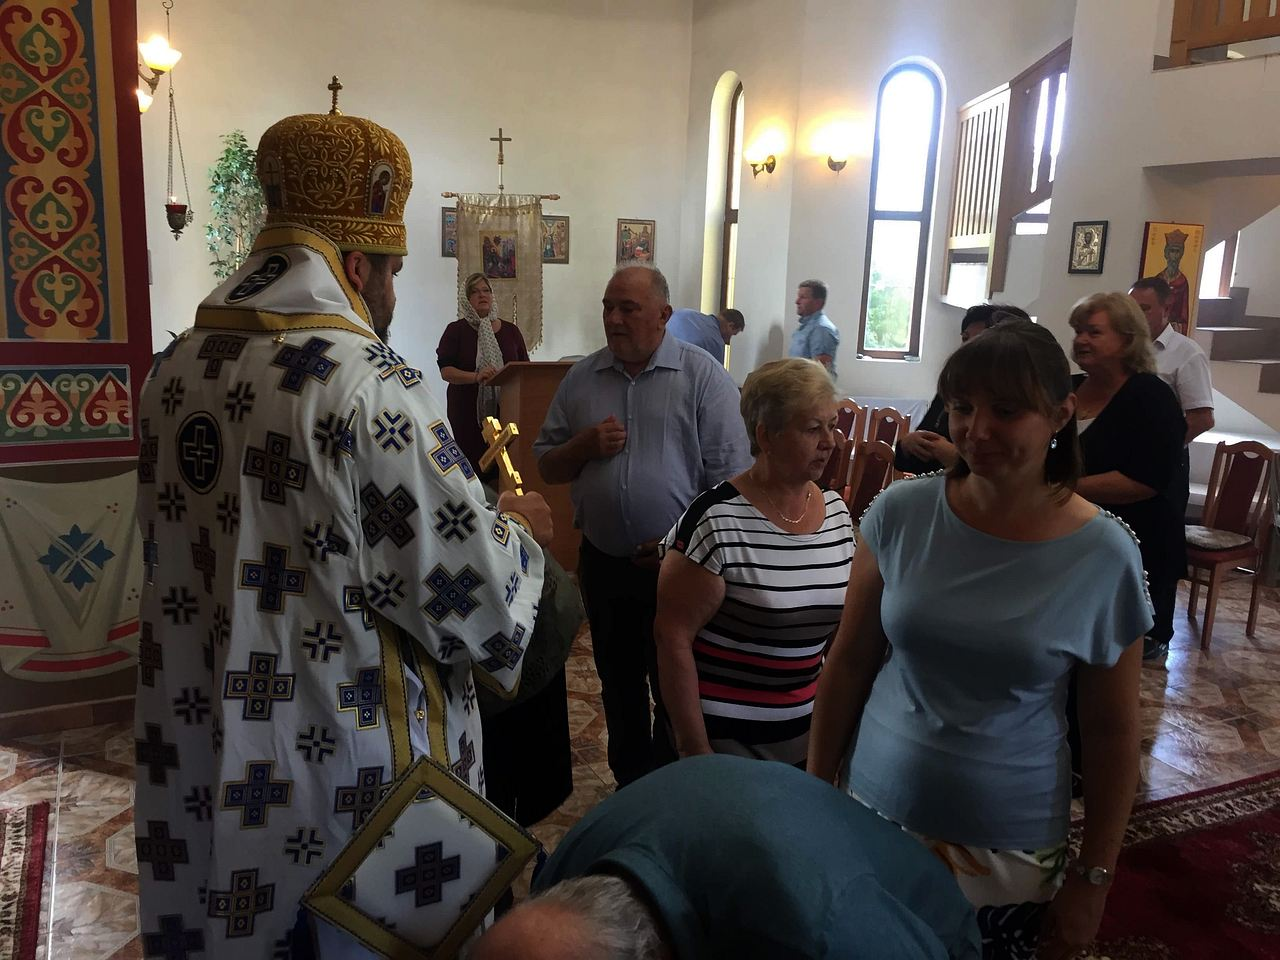 2019-08-17-sobrance-izaias-IMG_1248_1